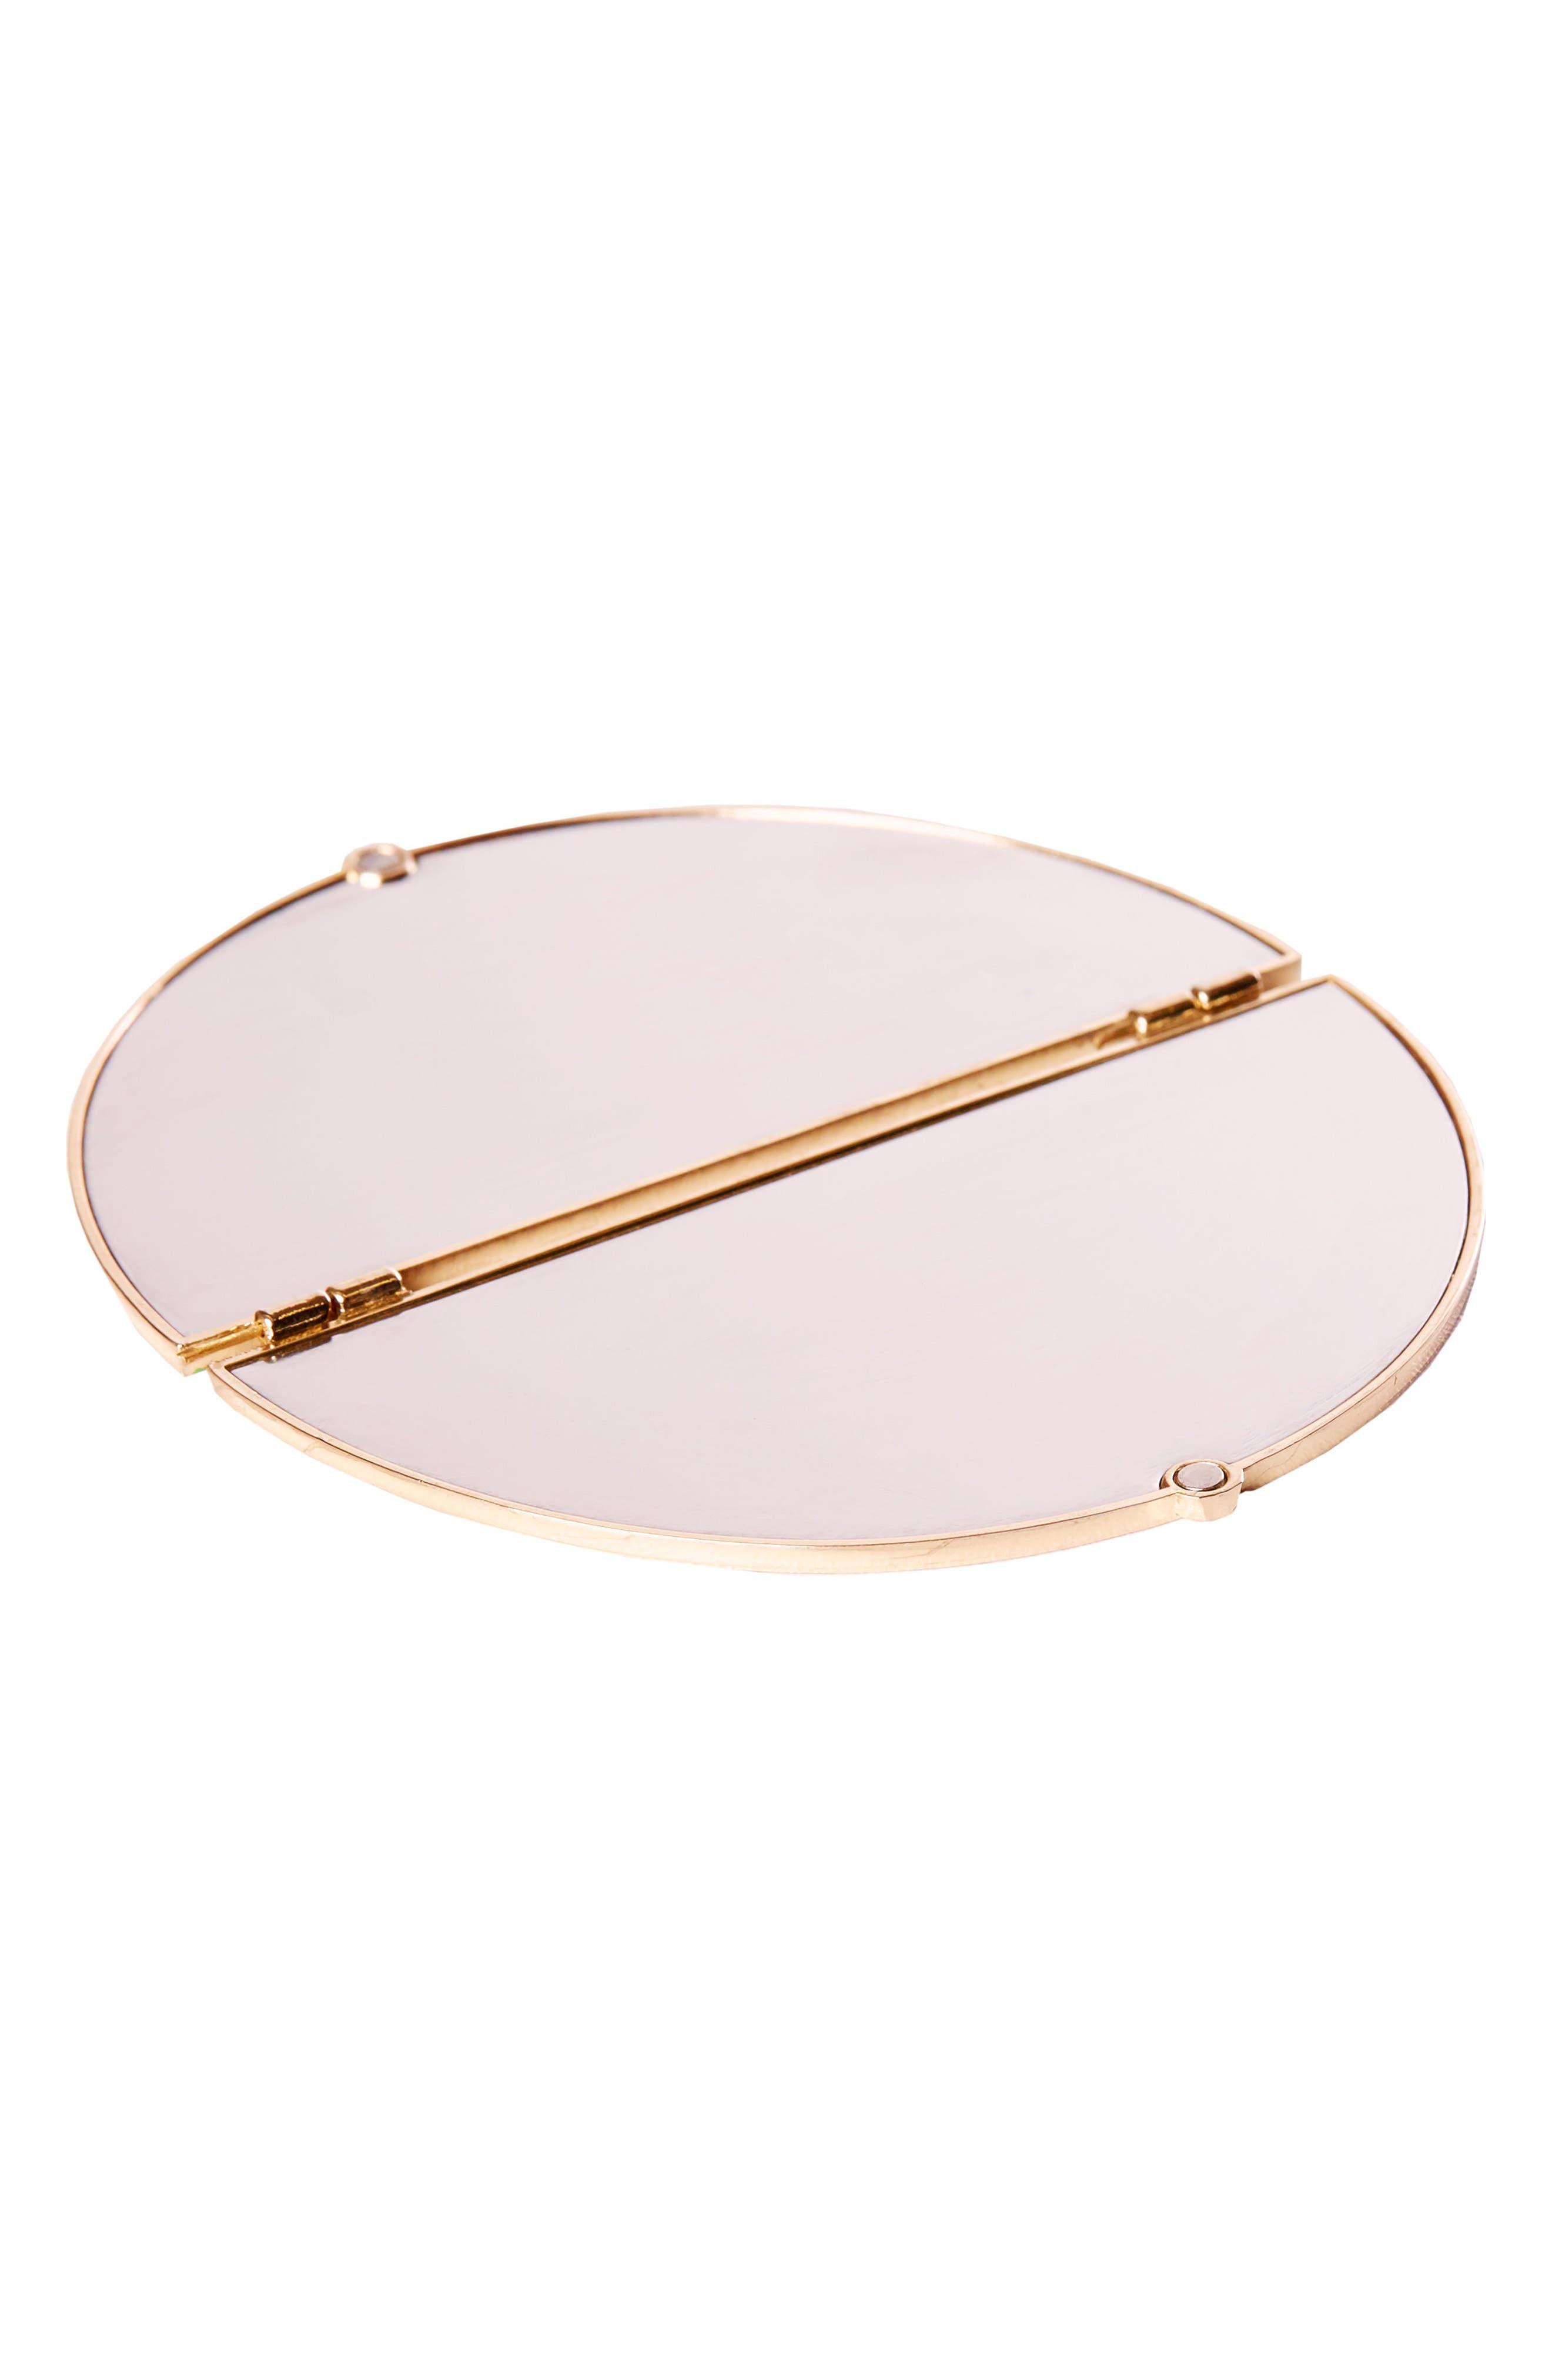 Skinny Dip Compact Mirror,                             Alternate thumbnail 2, color,                             No Color